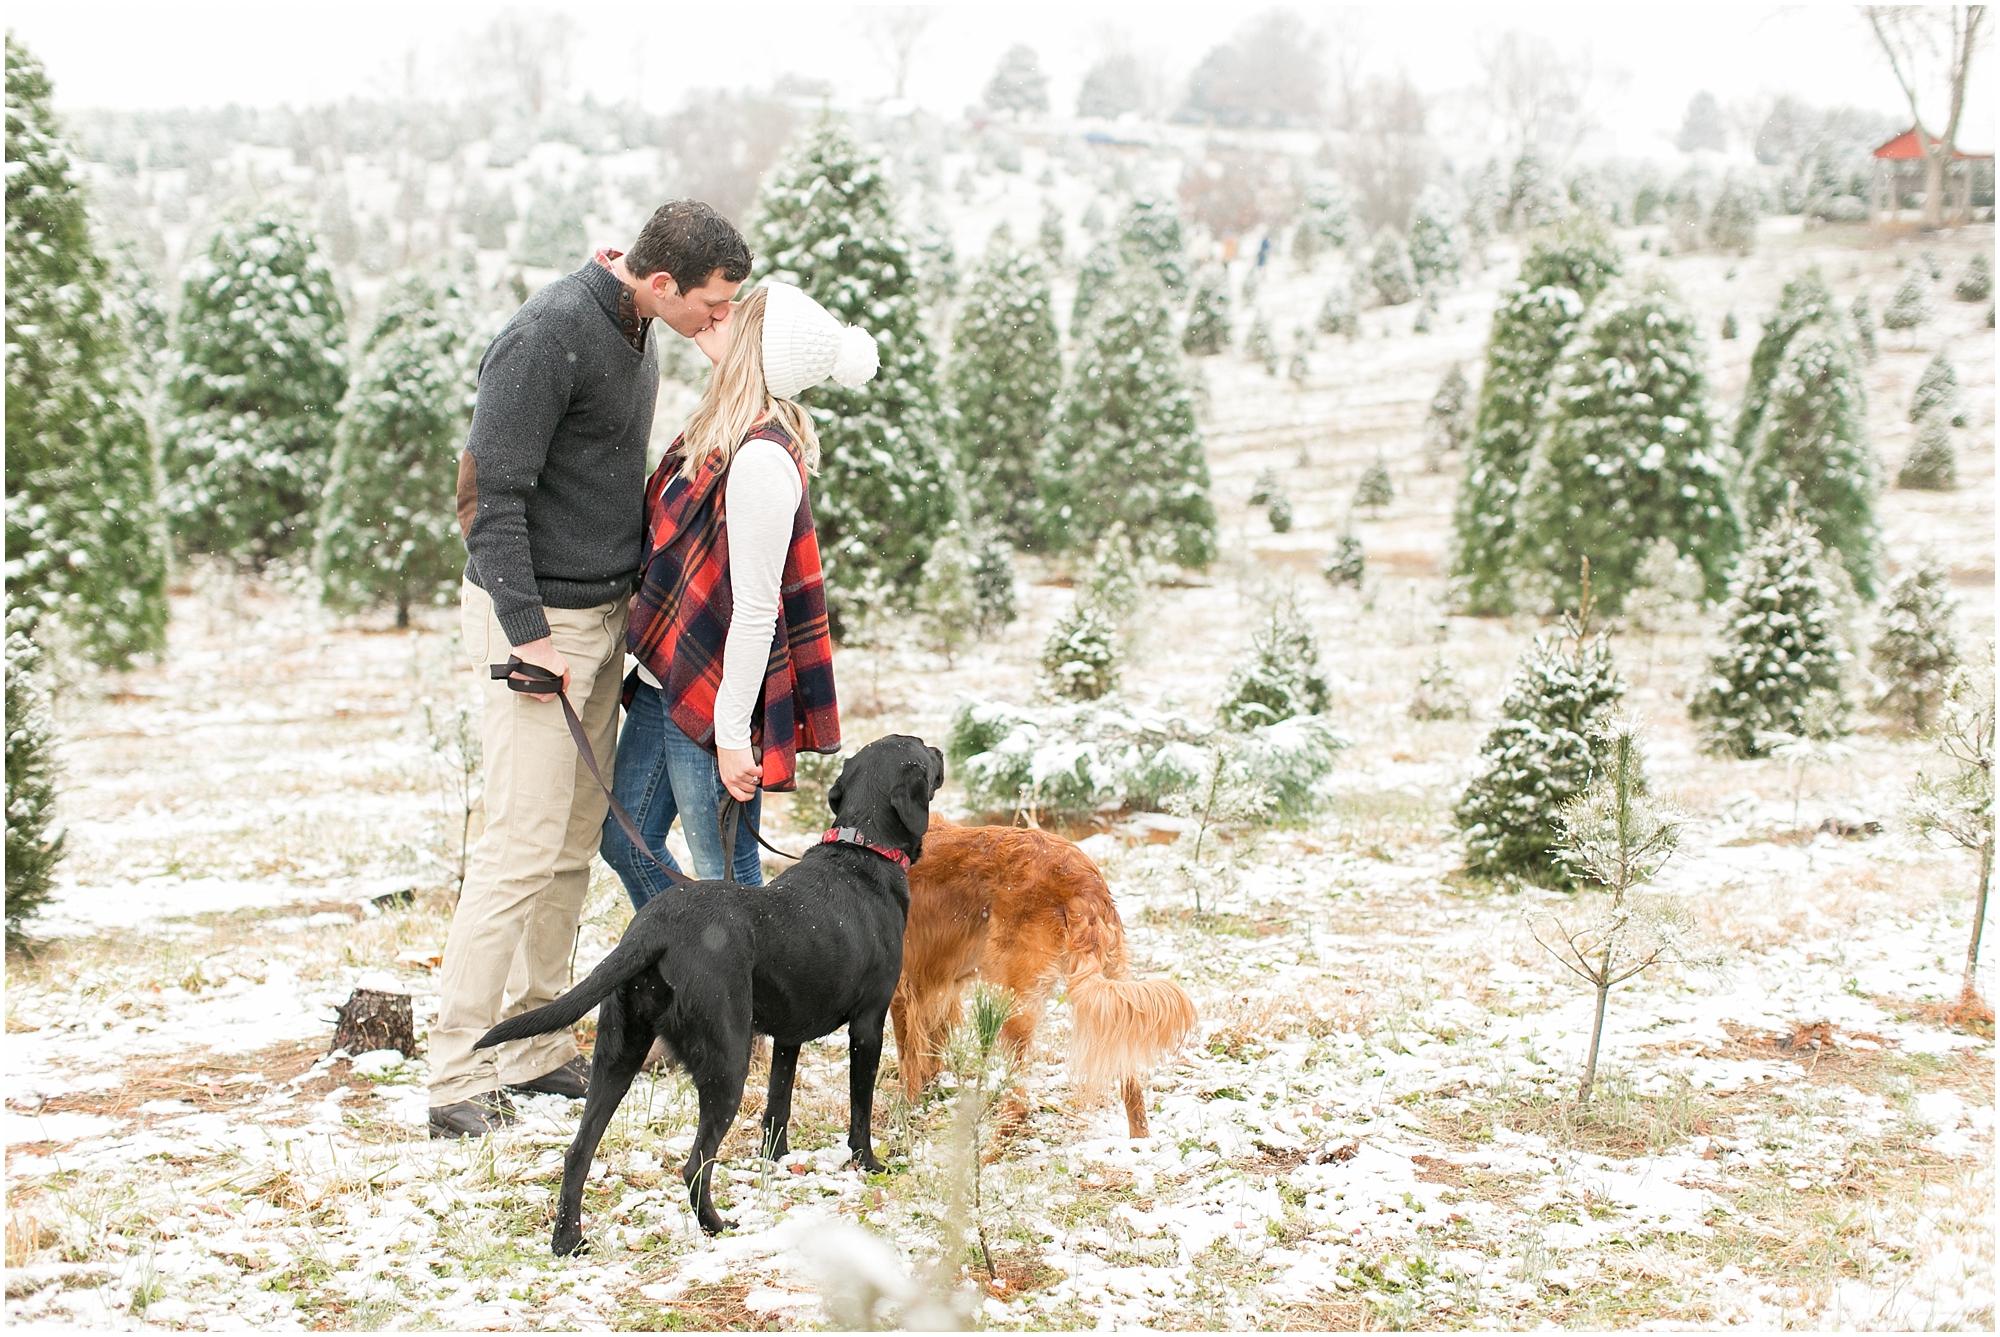 belmont christmas tree farm engagement photography winter engagement snowing